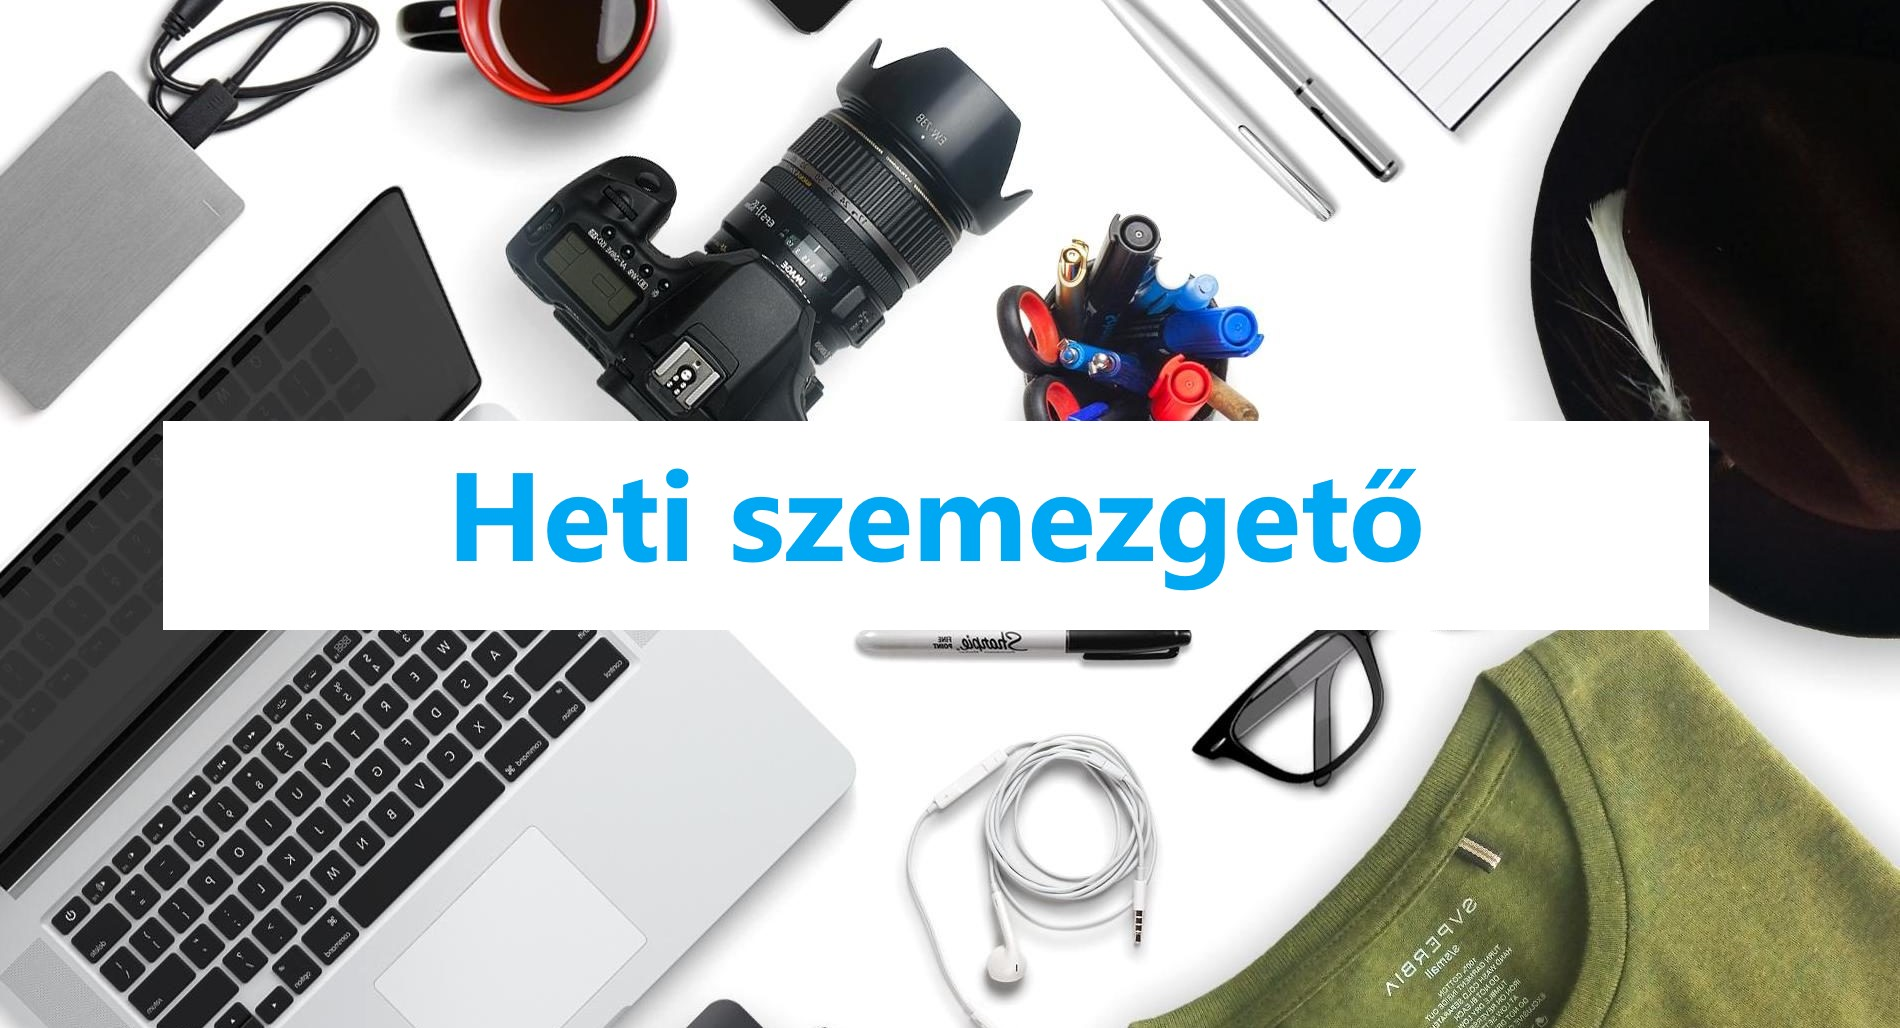 heti_szemezgeto_uj_48.jpg